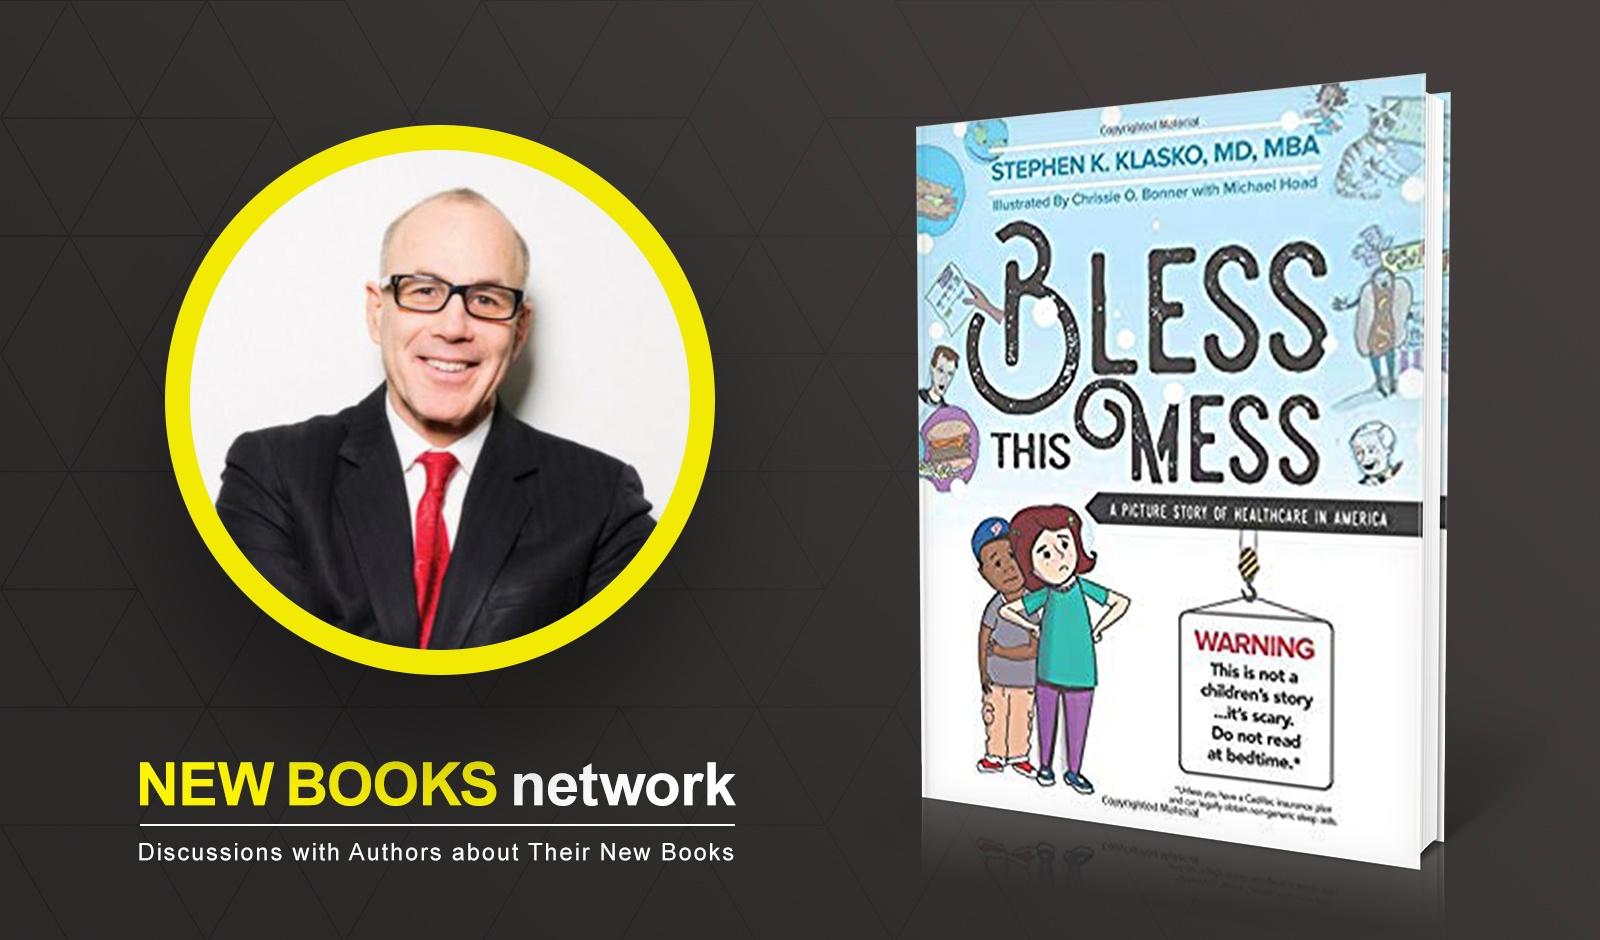 New Books In Medicine Podcast: Stephen Klasko's Creative Ideas For Healthcare Reform